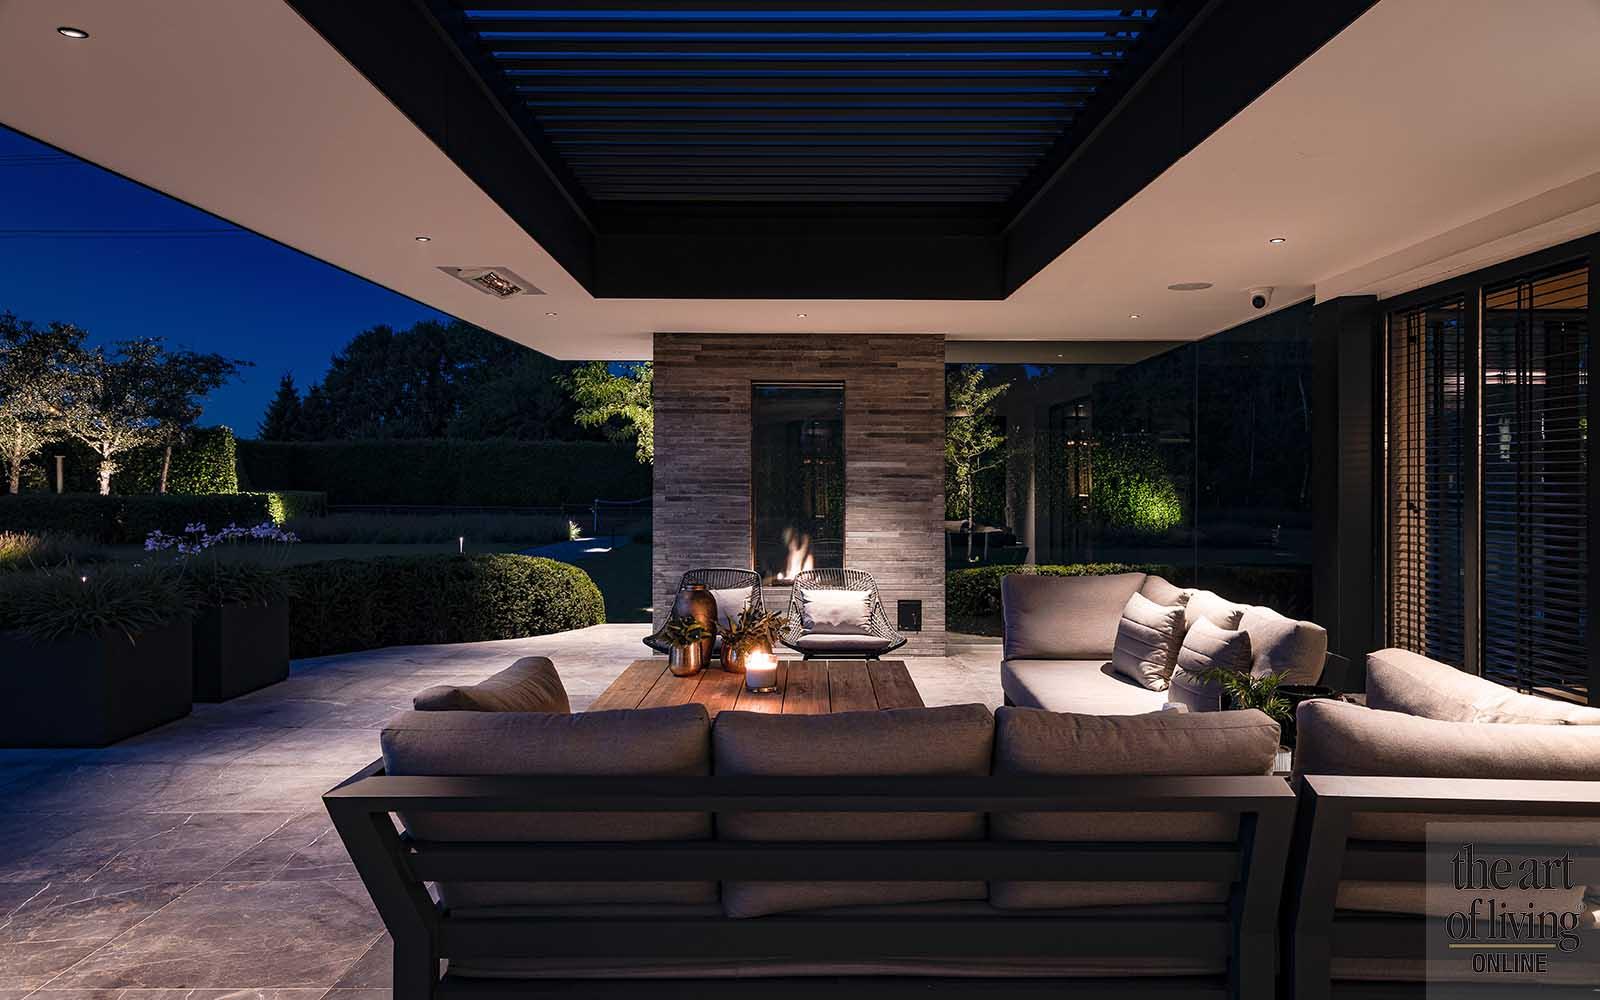 Ultraluxe villa   Knops, the art of living